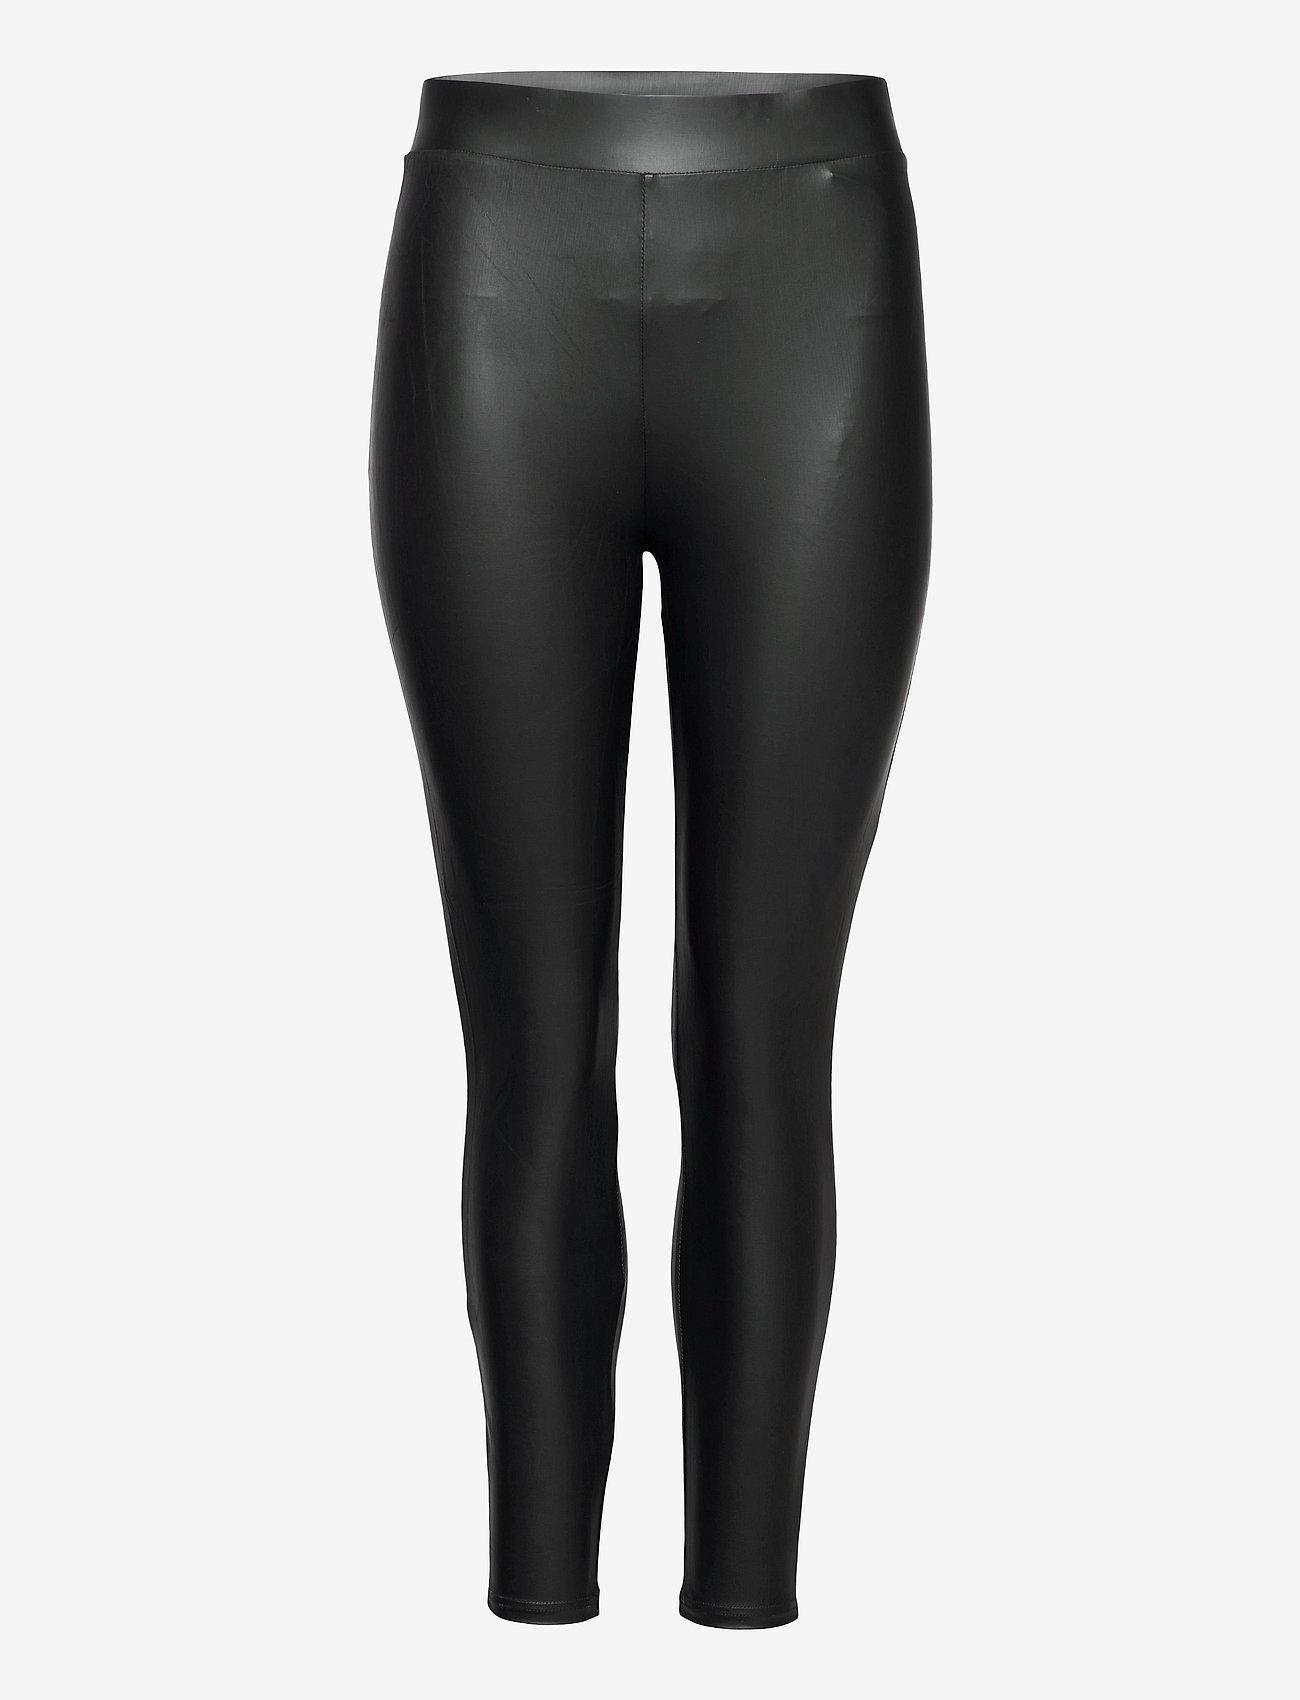 ONLY Carmakoma - CARROOL COATED LEGGING - læderbukser - black - 0